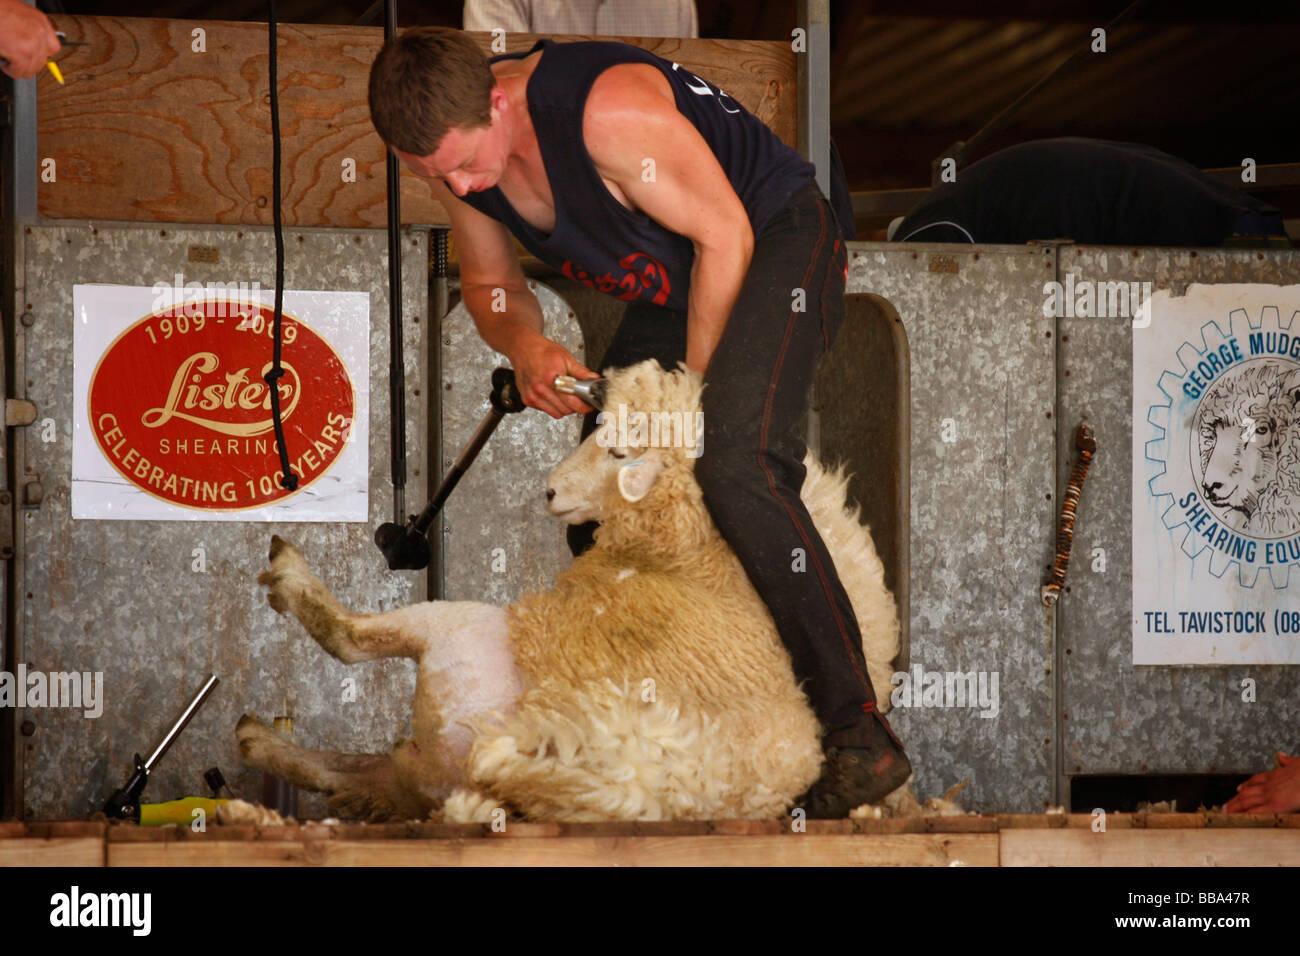 Sheep Shearing at Devon County Show - Stock Image